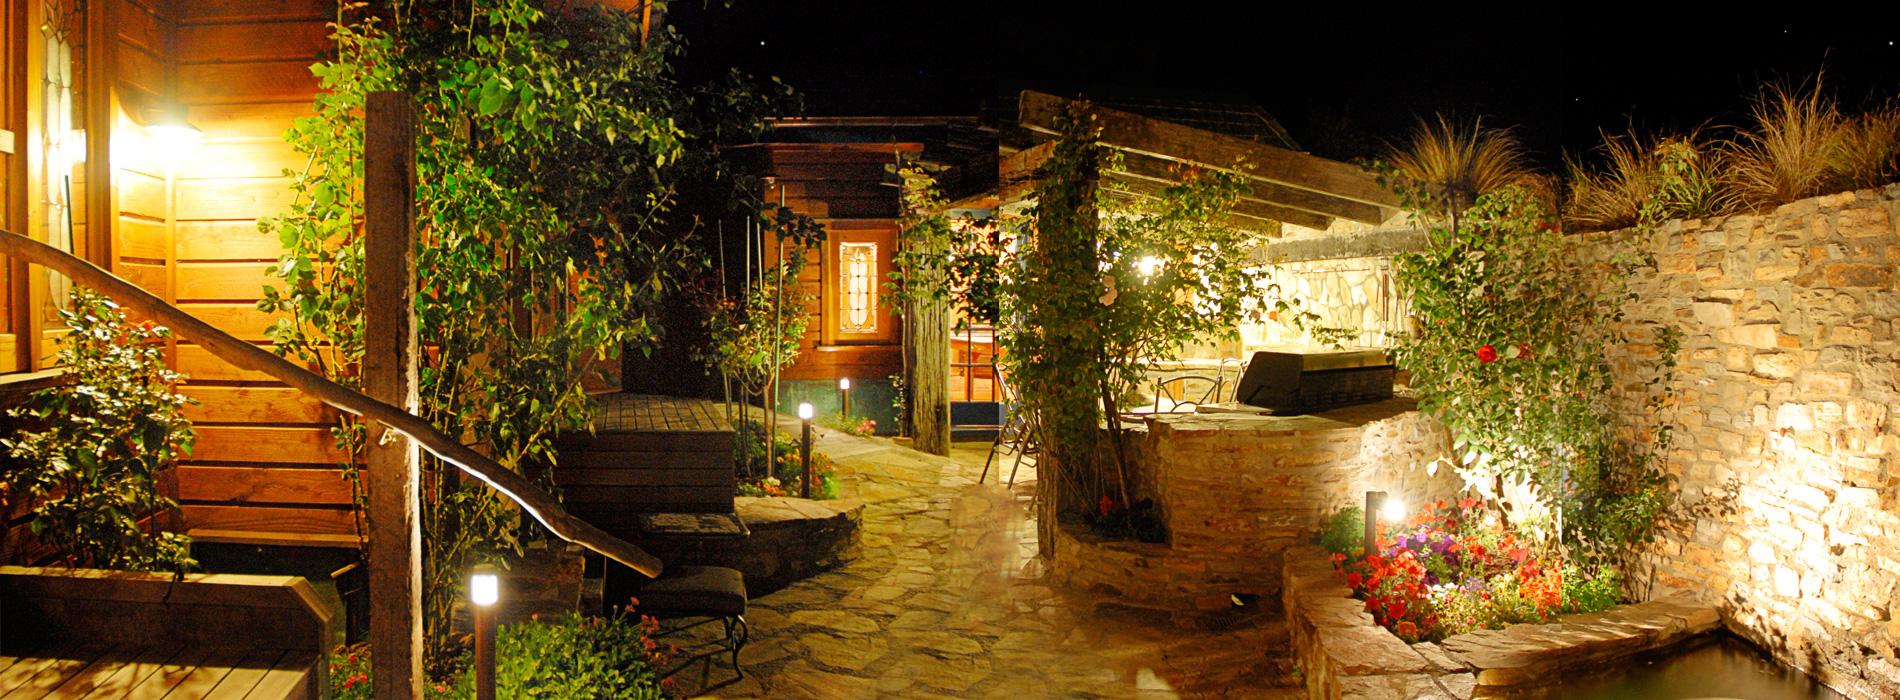 Lumipro focos para jardin iluminaci n de exterior for Jardines pequenos con luces